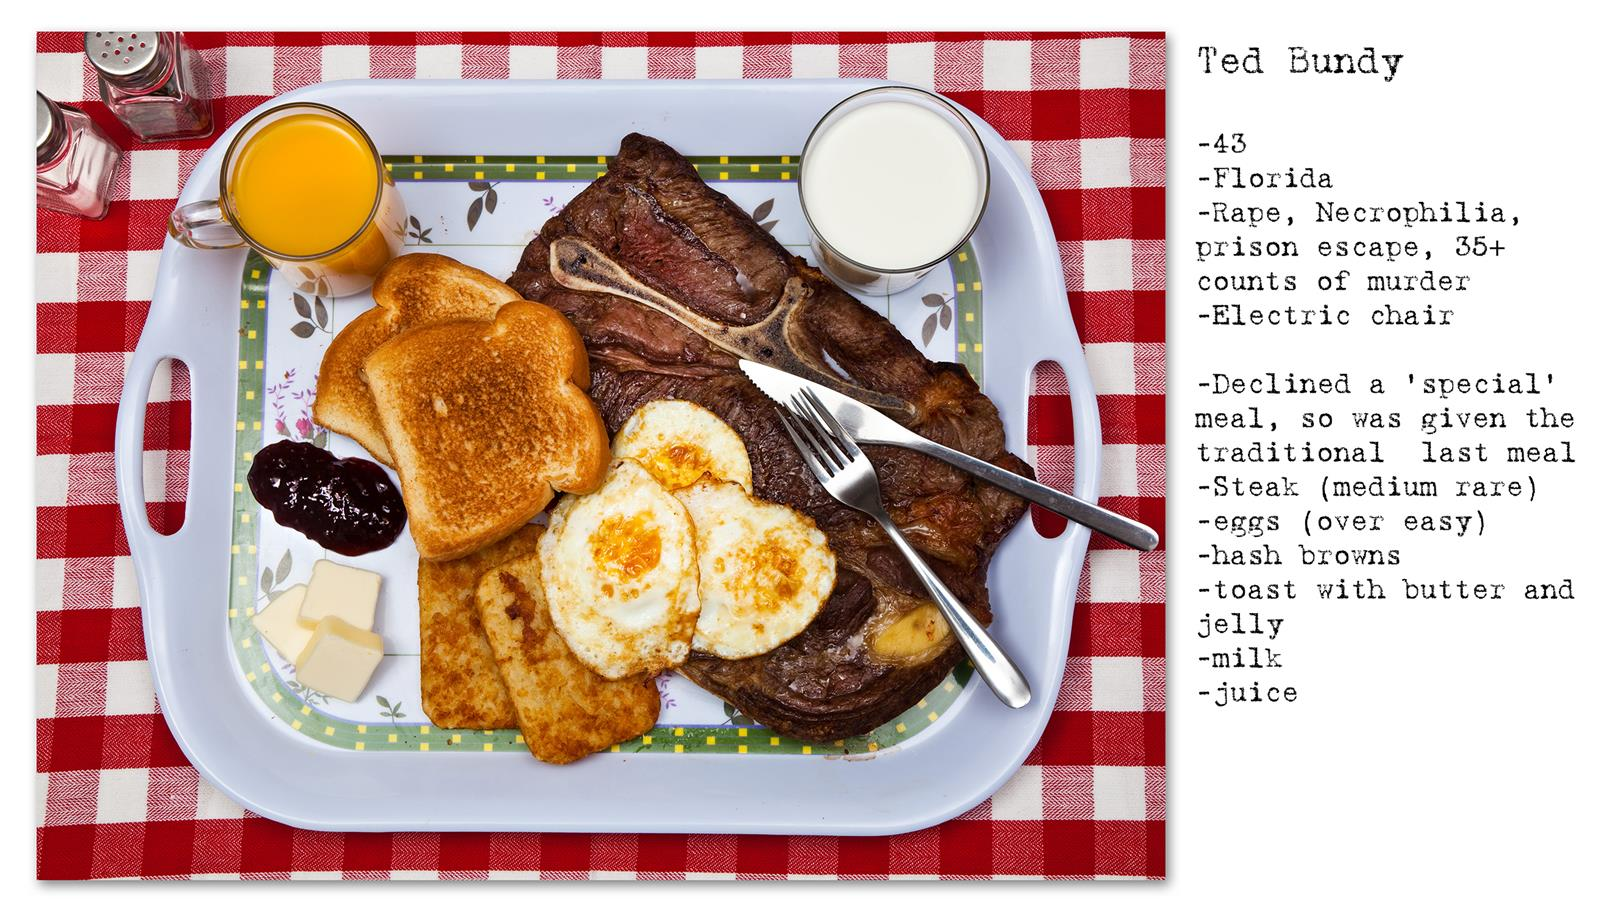 Death Row Prisoner's Last Meal (9)